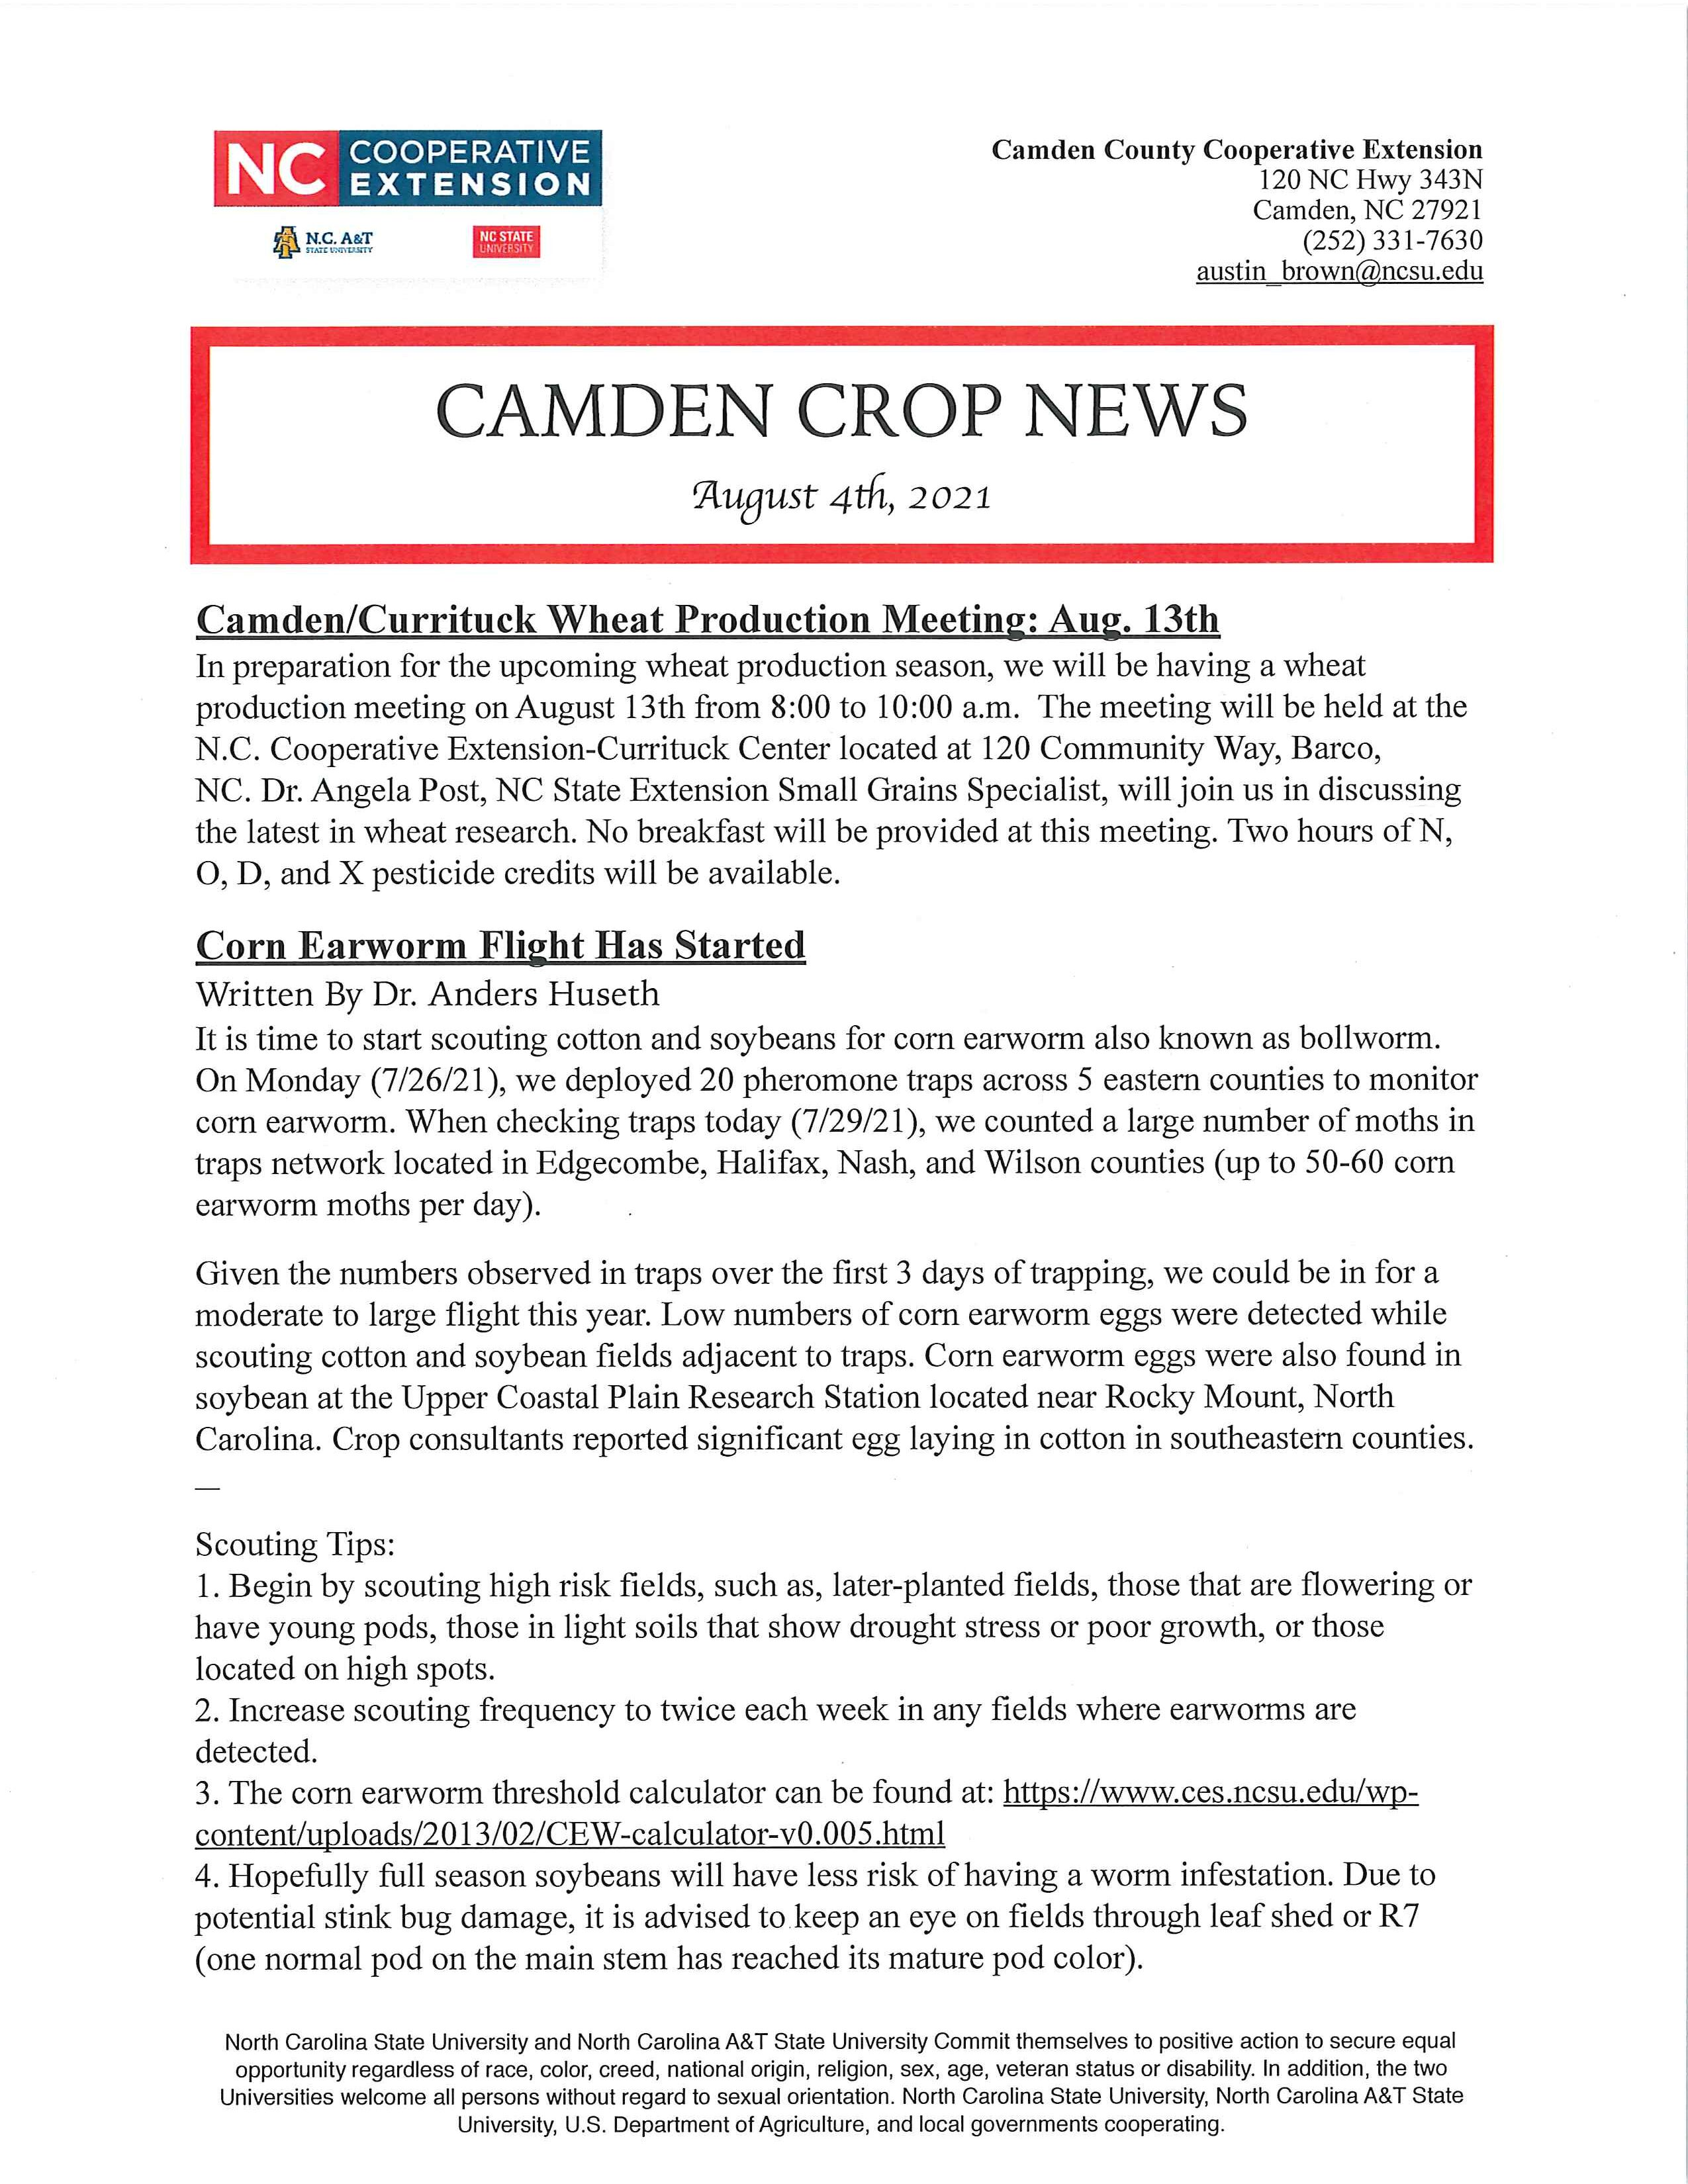 Camden County Crop News flyer